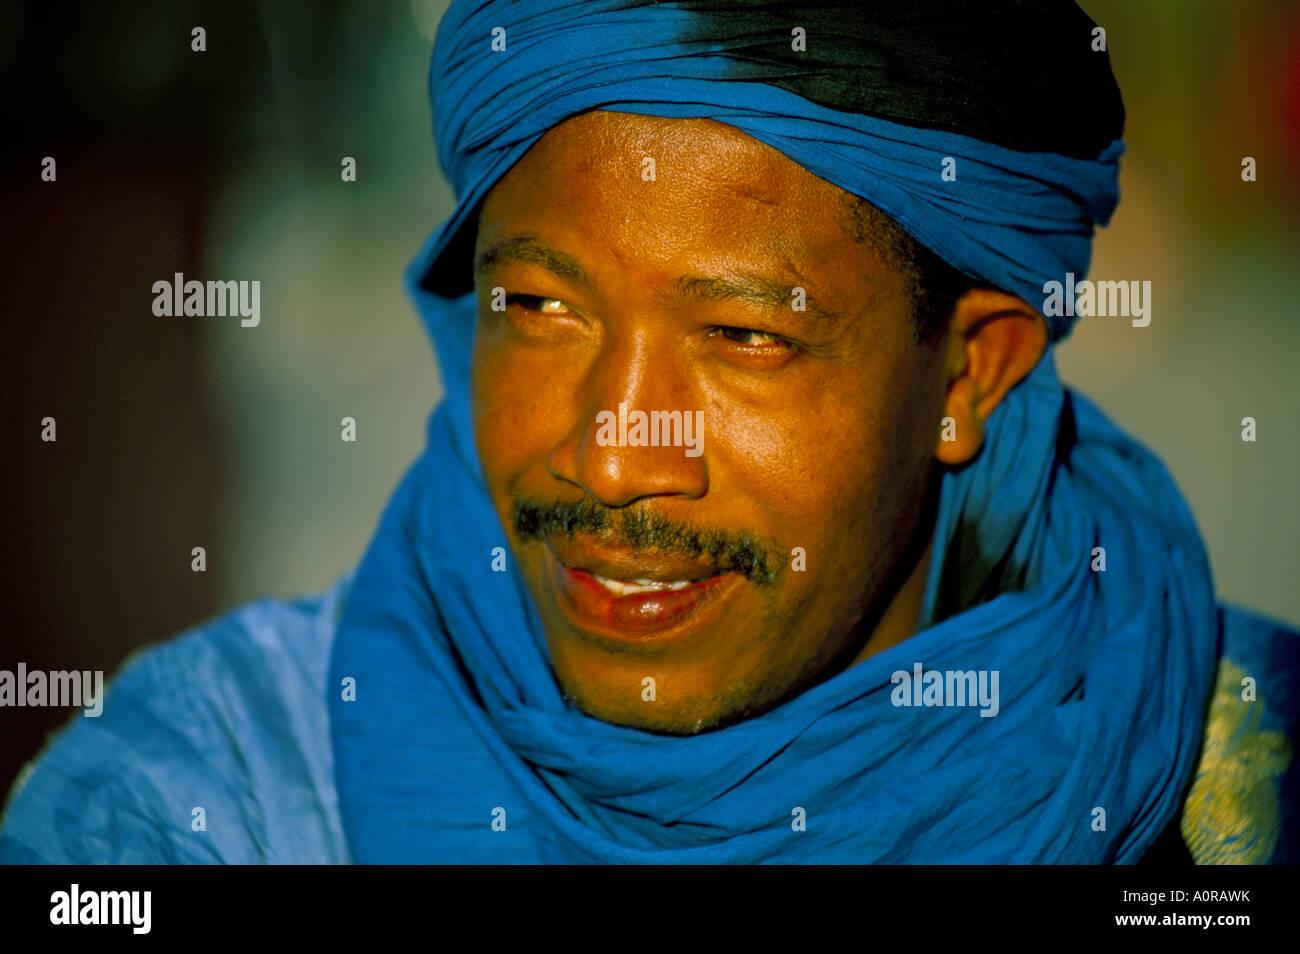 Man wearing blue headscarf Djemma el Fna Marrakech Marrakesh Morocco North Africa Africa - Stock Image